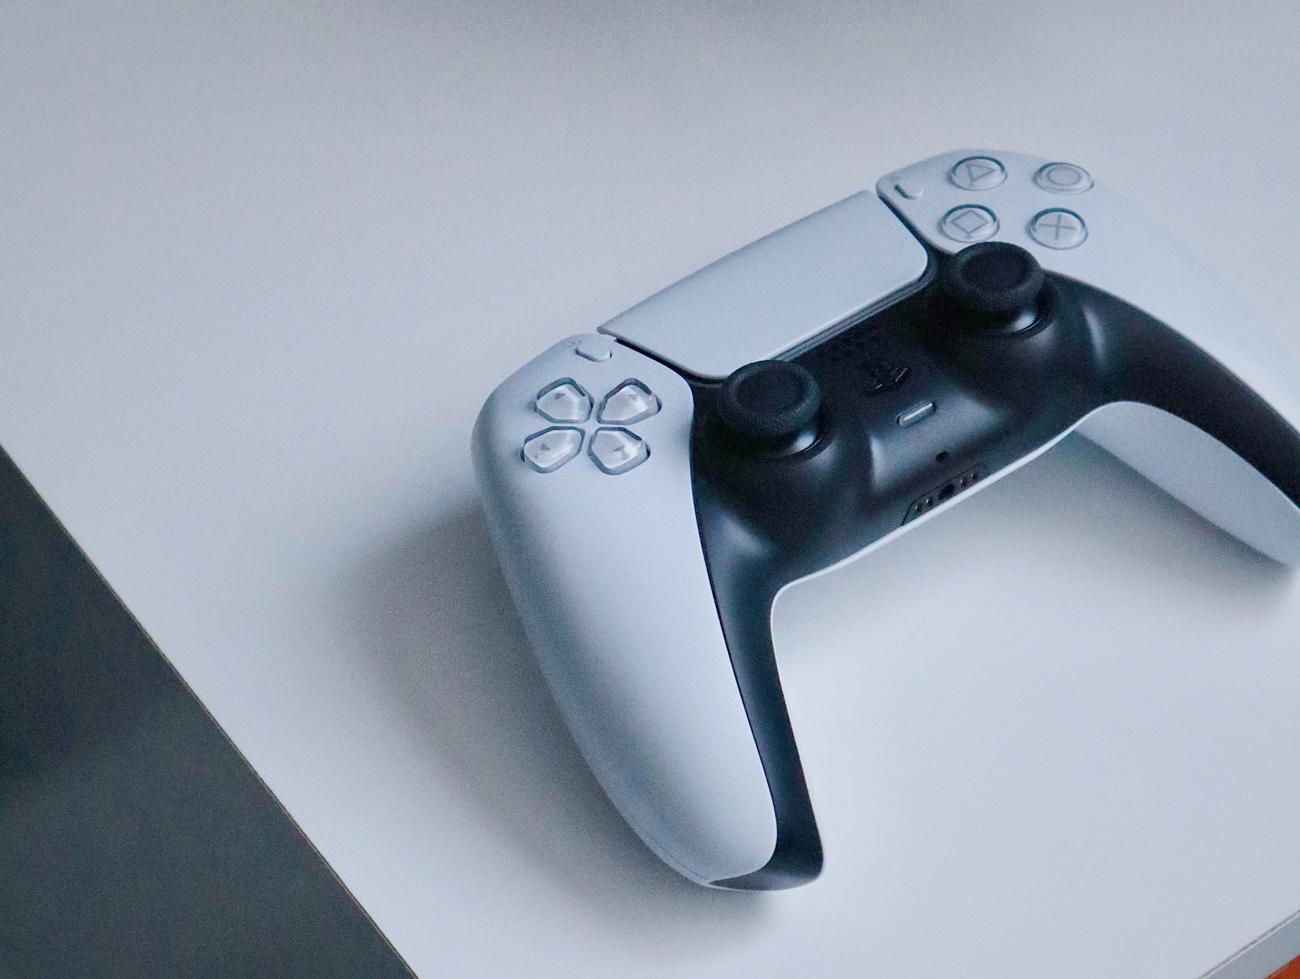 🎮 Sony vypustyť onovlenu PlayStation 5 z inšymy detaljamy: boroťba z deficiytom